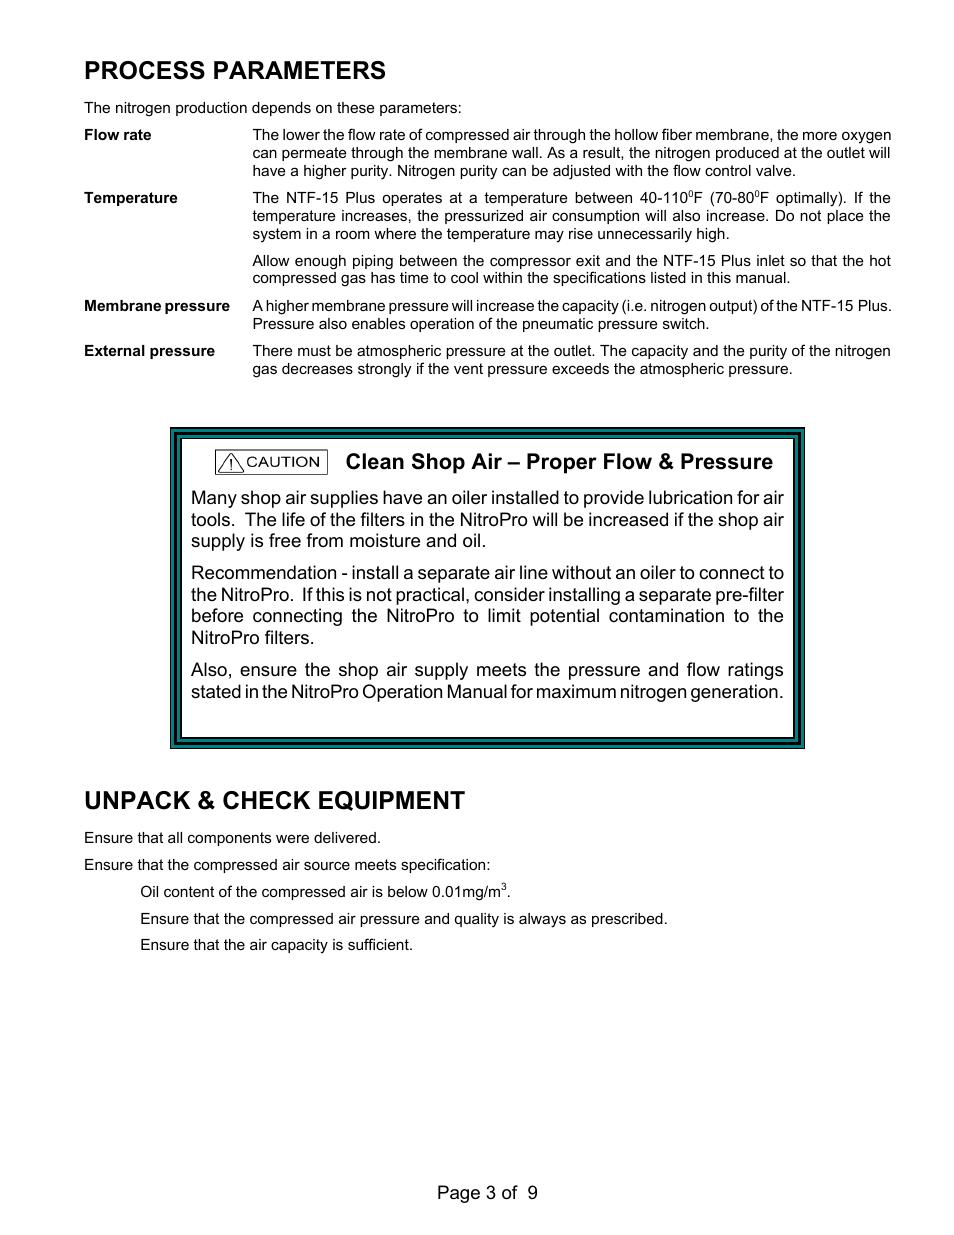 Process parameters, Unpack & check equipment, Clean shop air